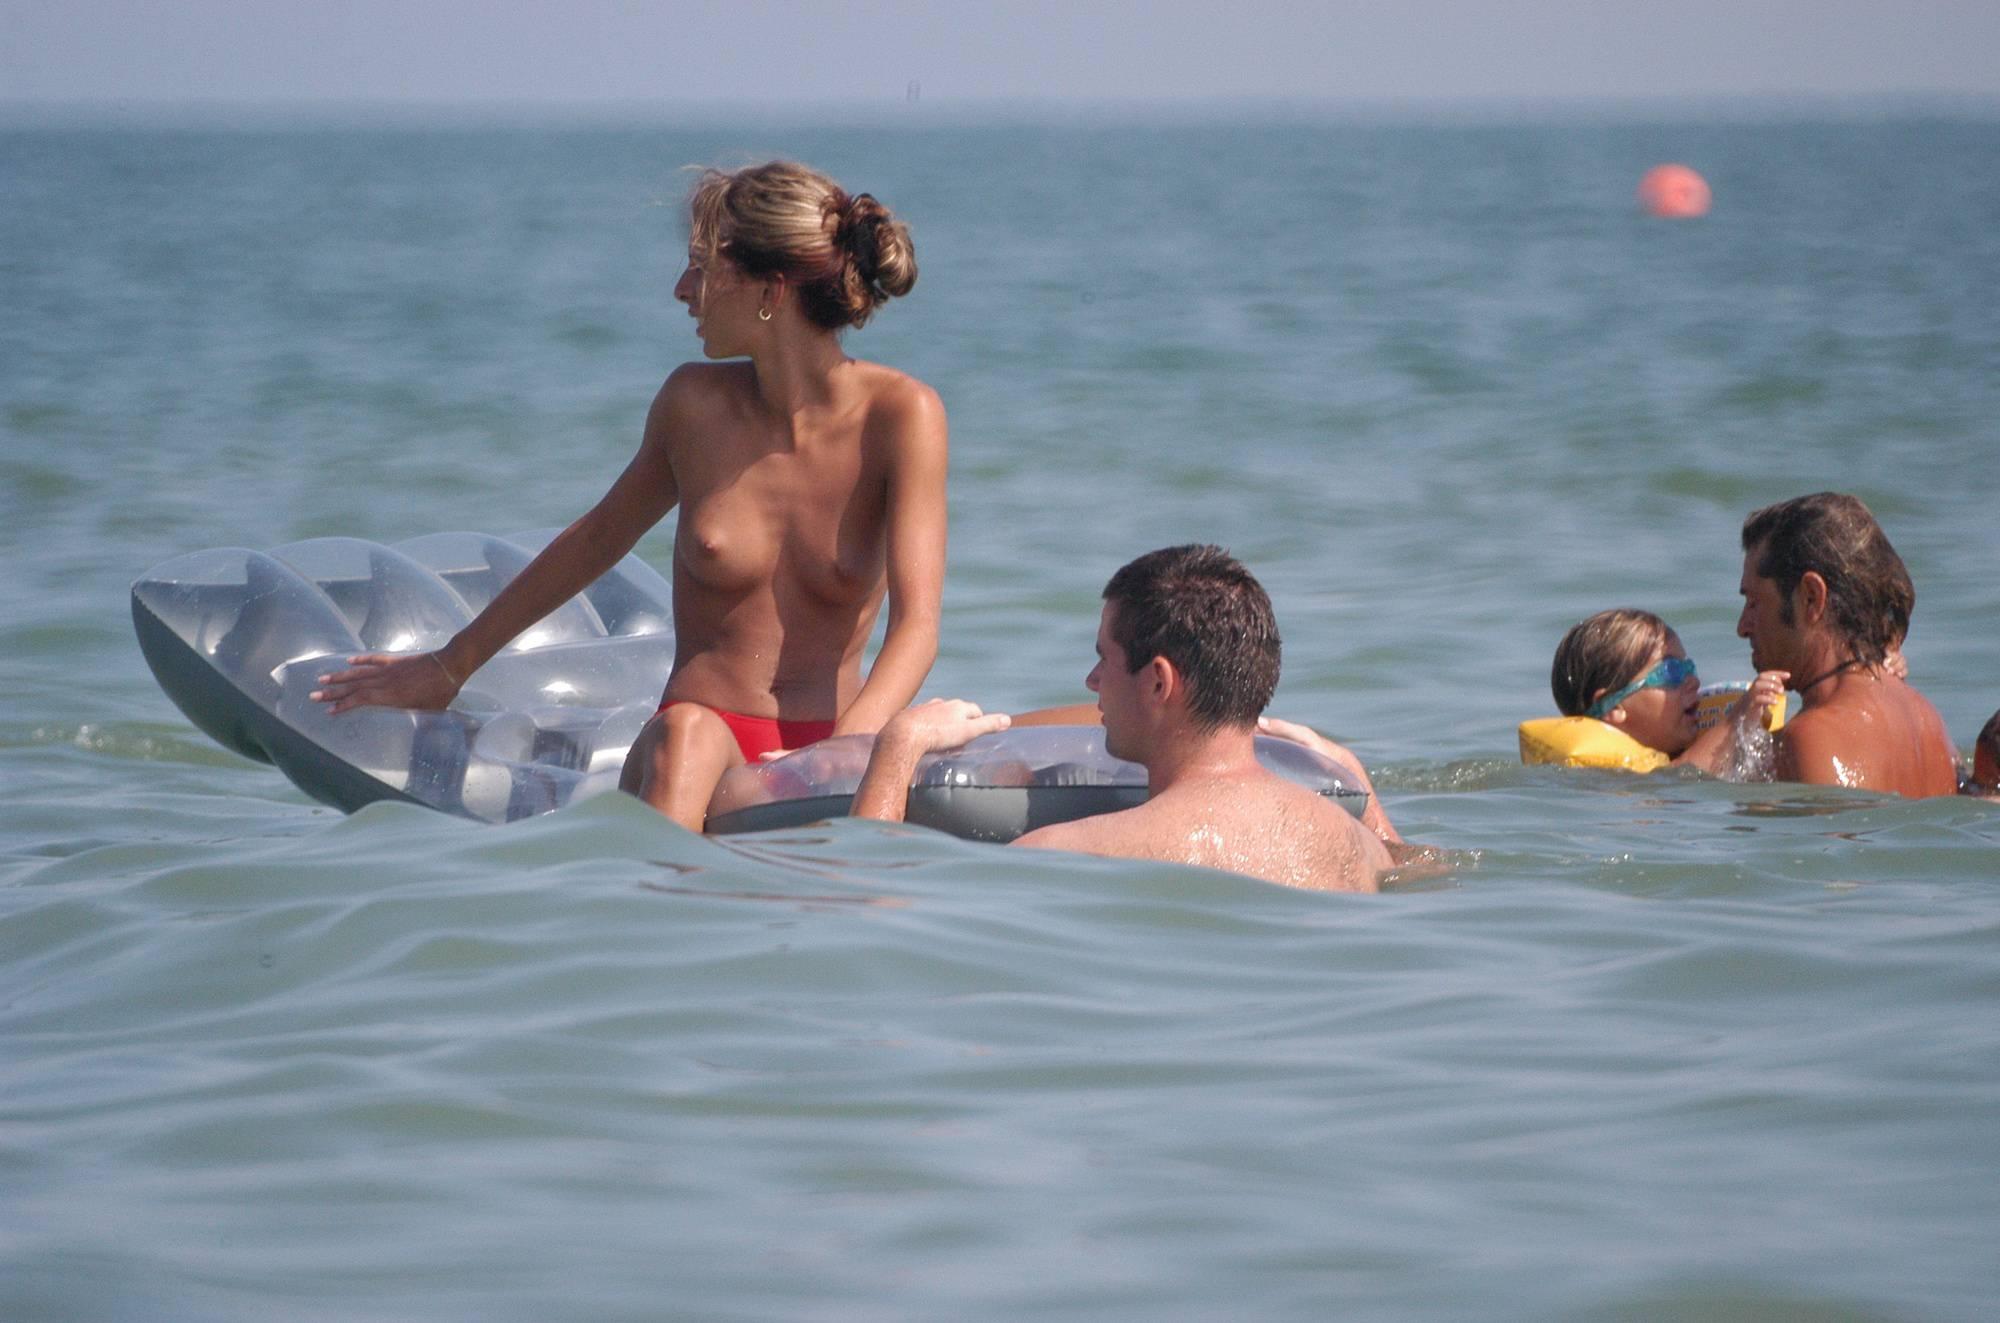 Nudist Photos Ula FKK Water Floatables - 1